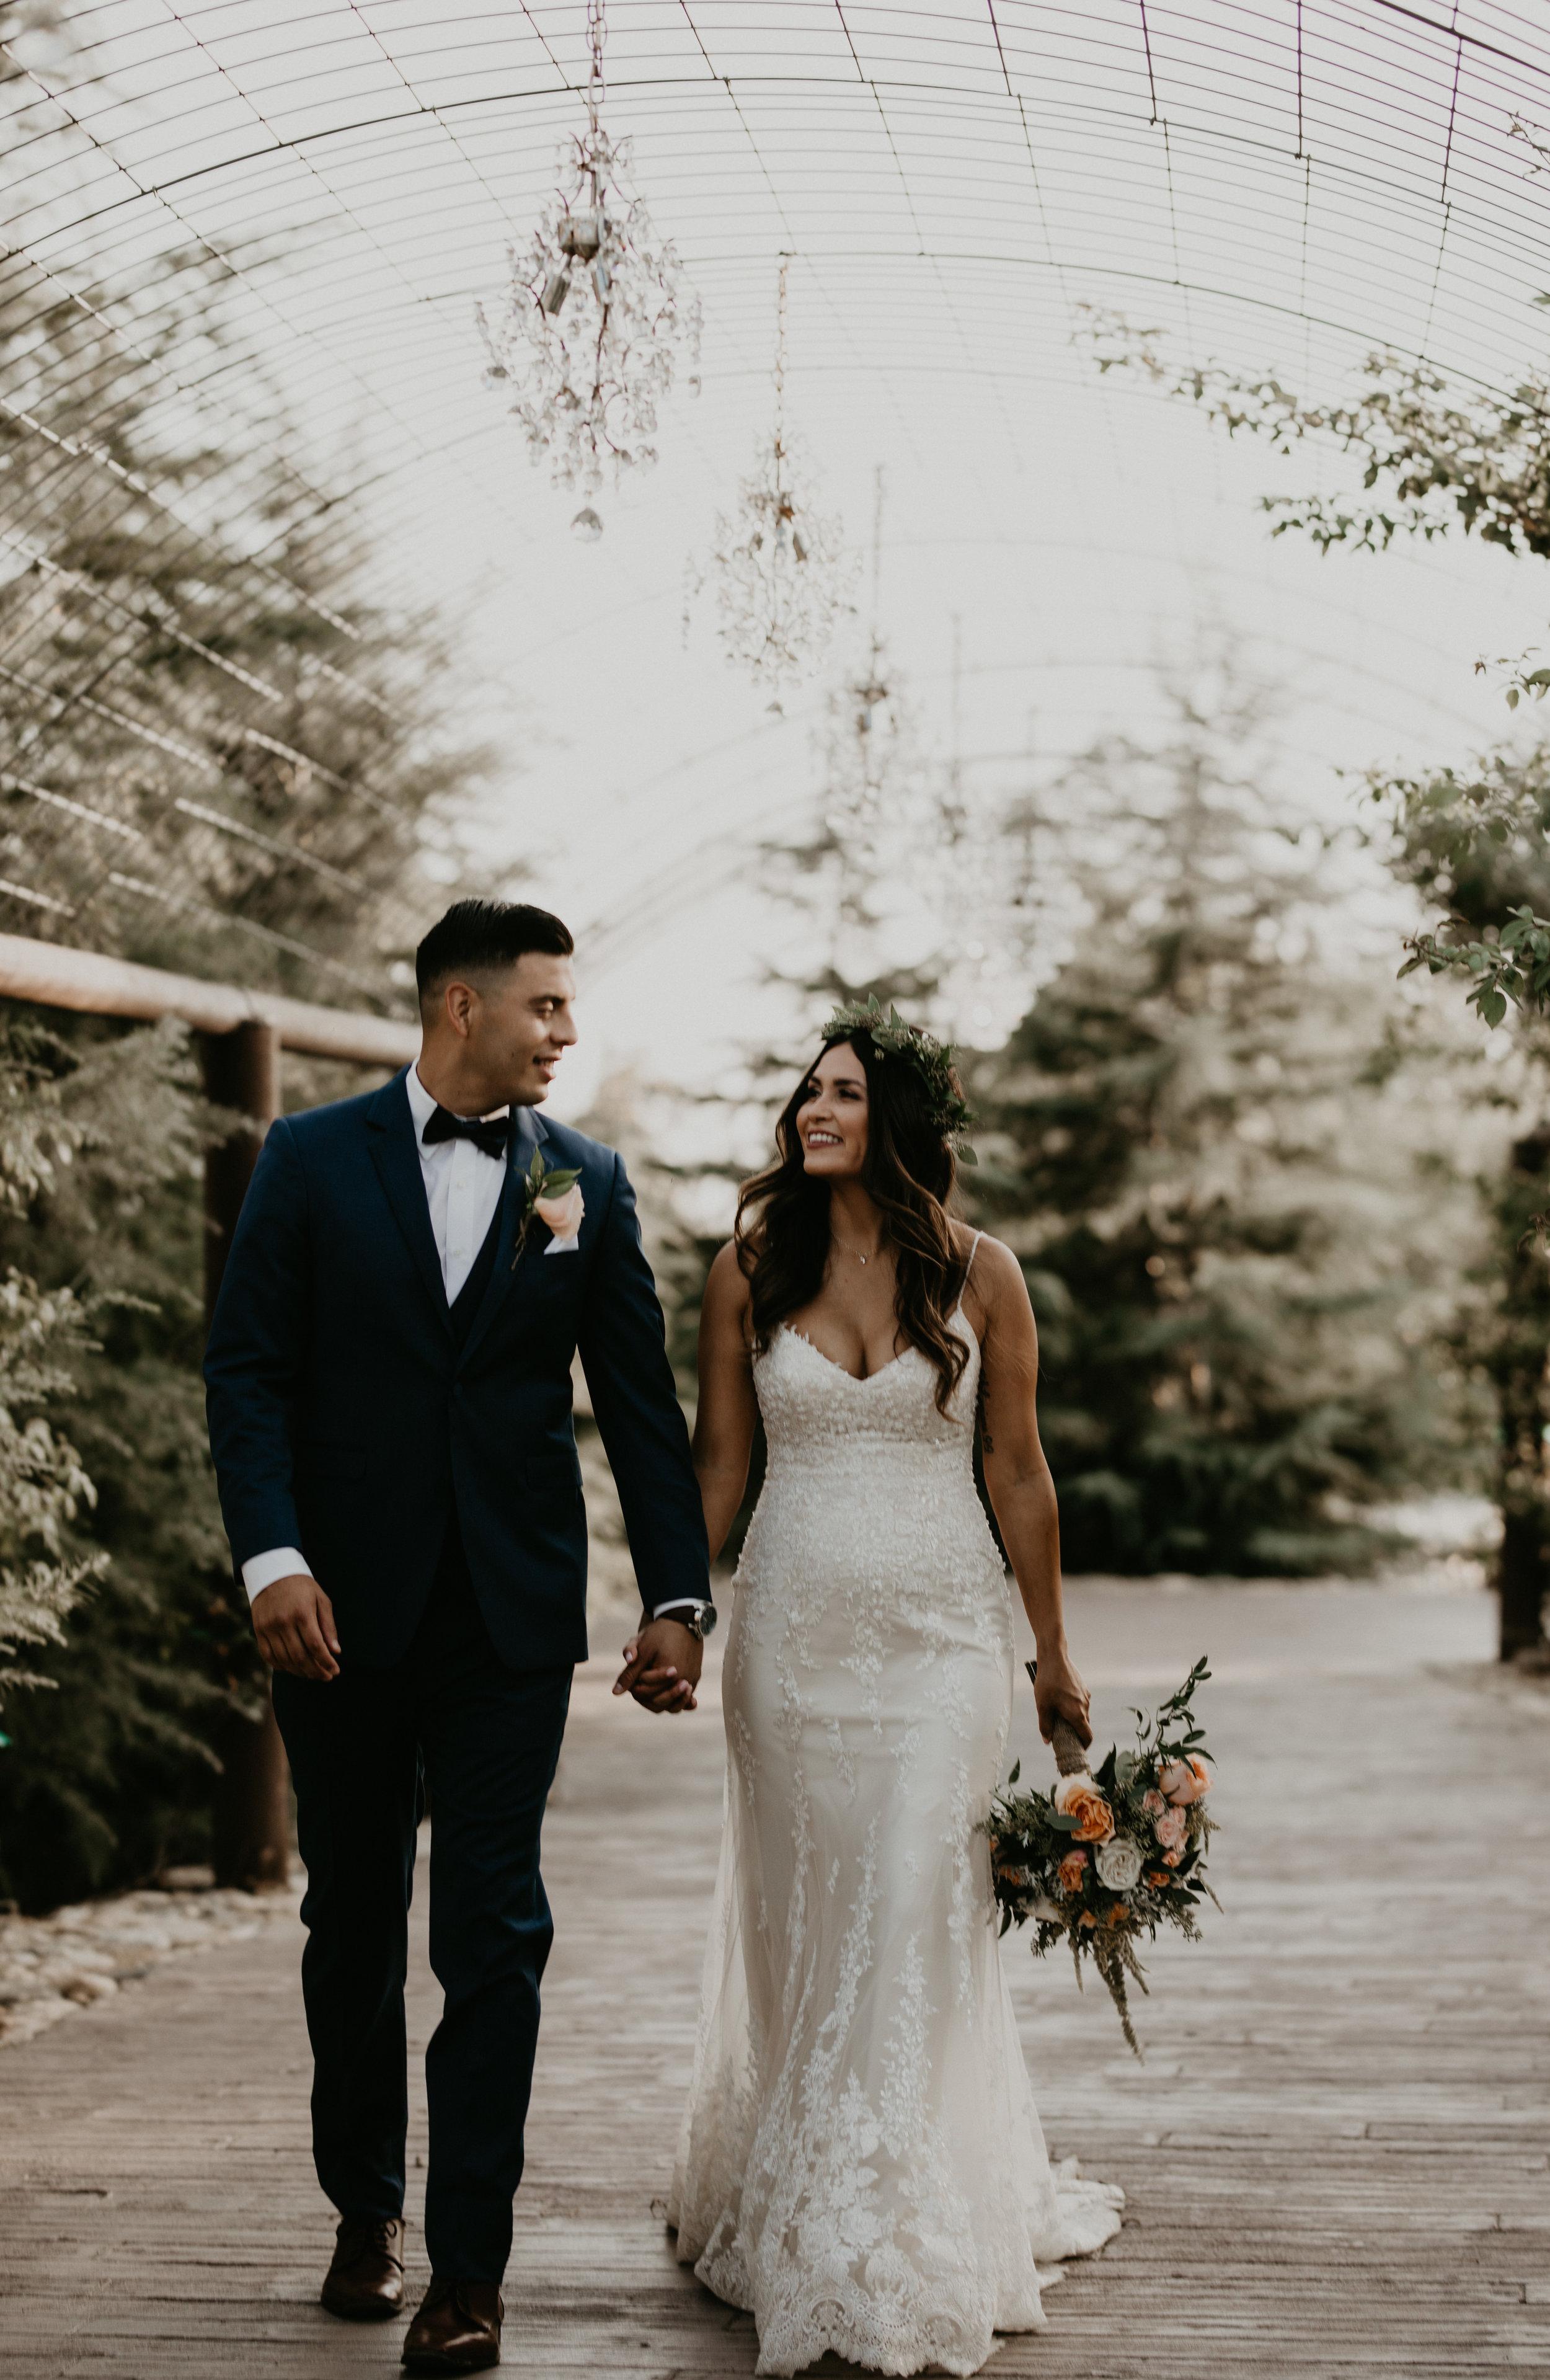 serendipity-weddings-photographer.jpg